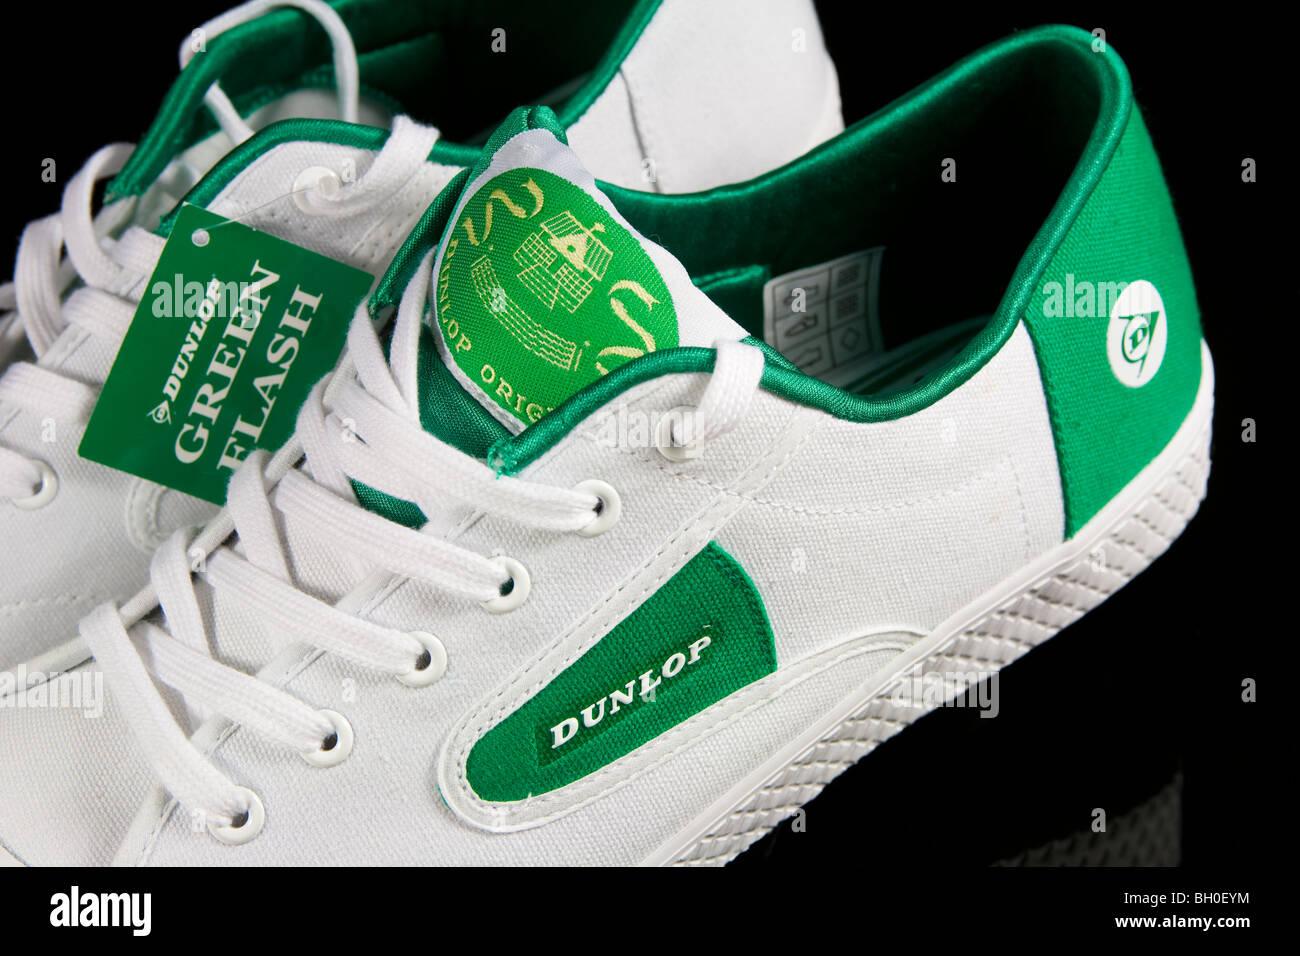 Verde Tenis Fotoamp; Destello Dunlop Un De Imagen Par Zapatos ZTOPXiku